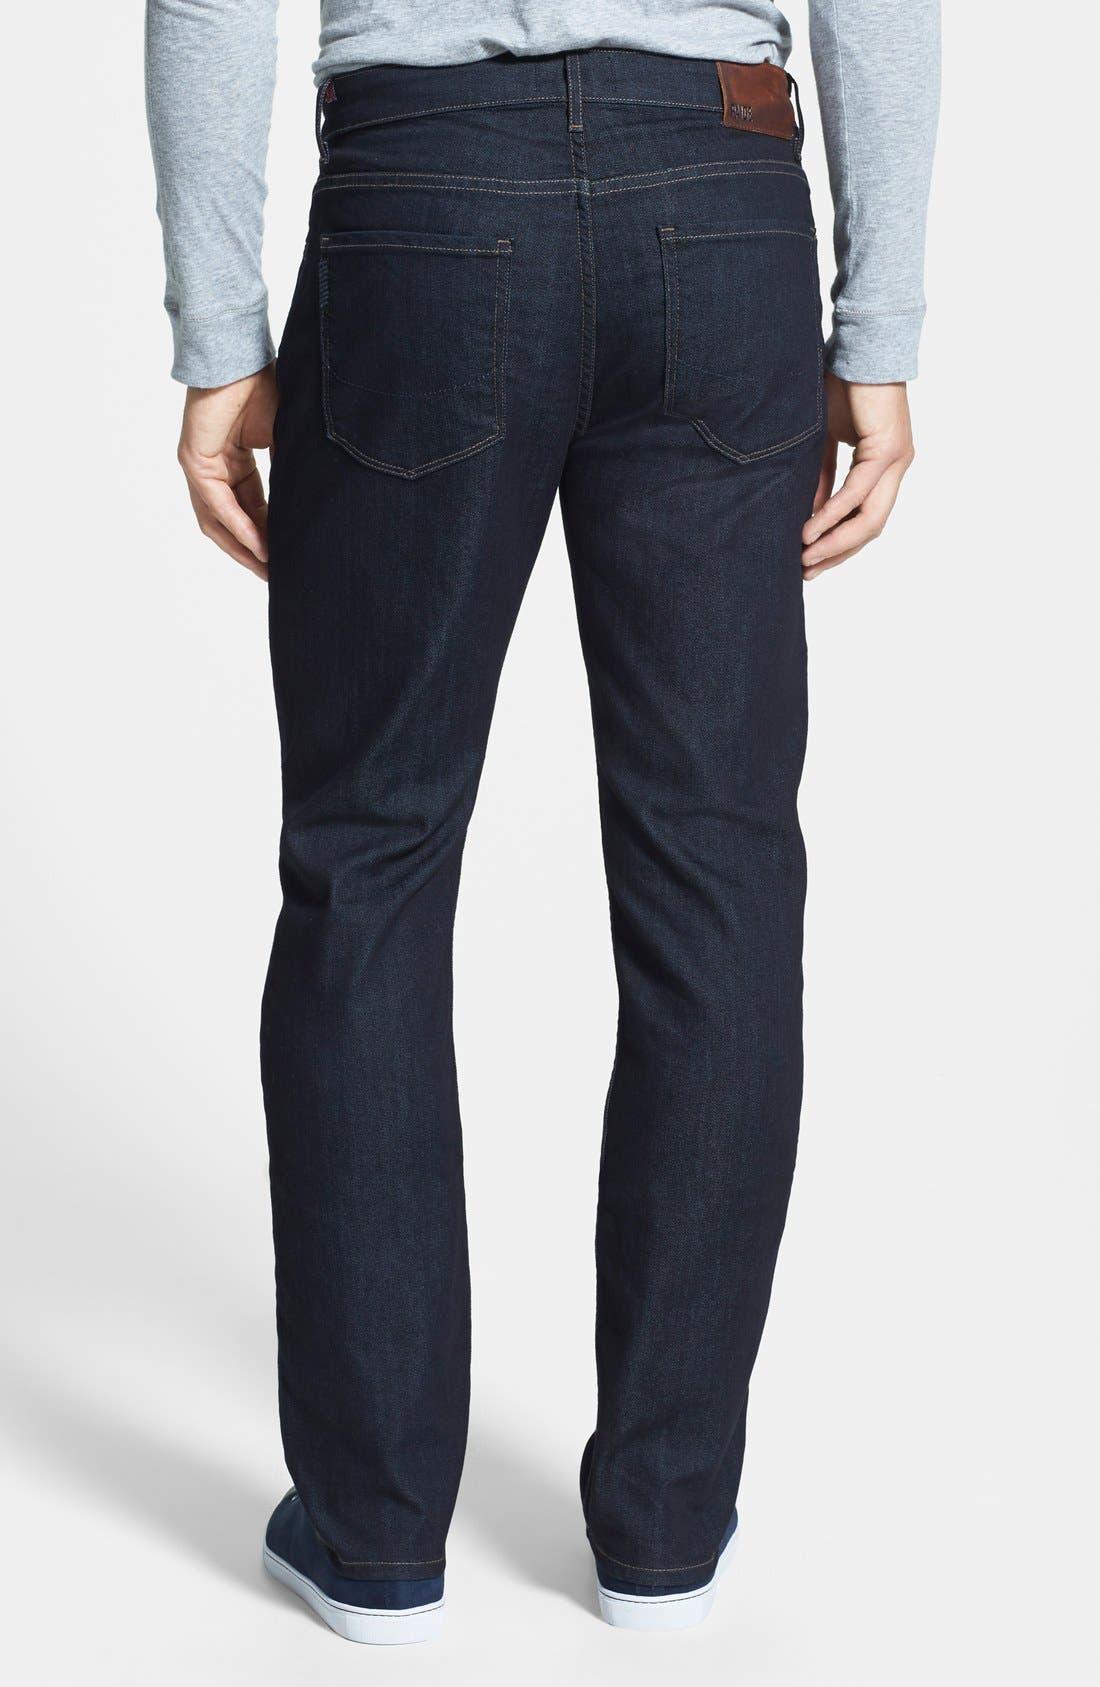 'Normandie' Straight Leg Jeans,                             Alternate thumbnail 3, color,                             400